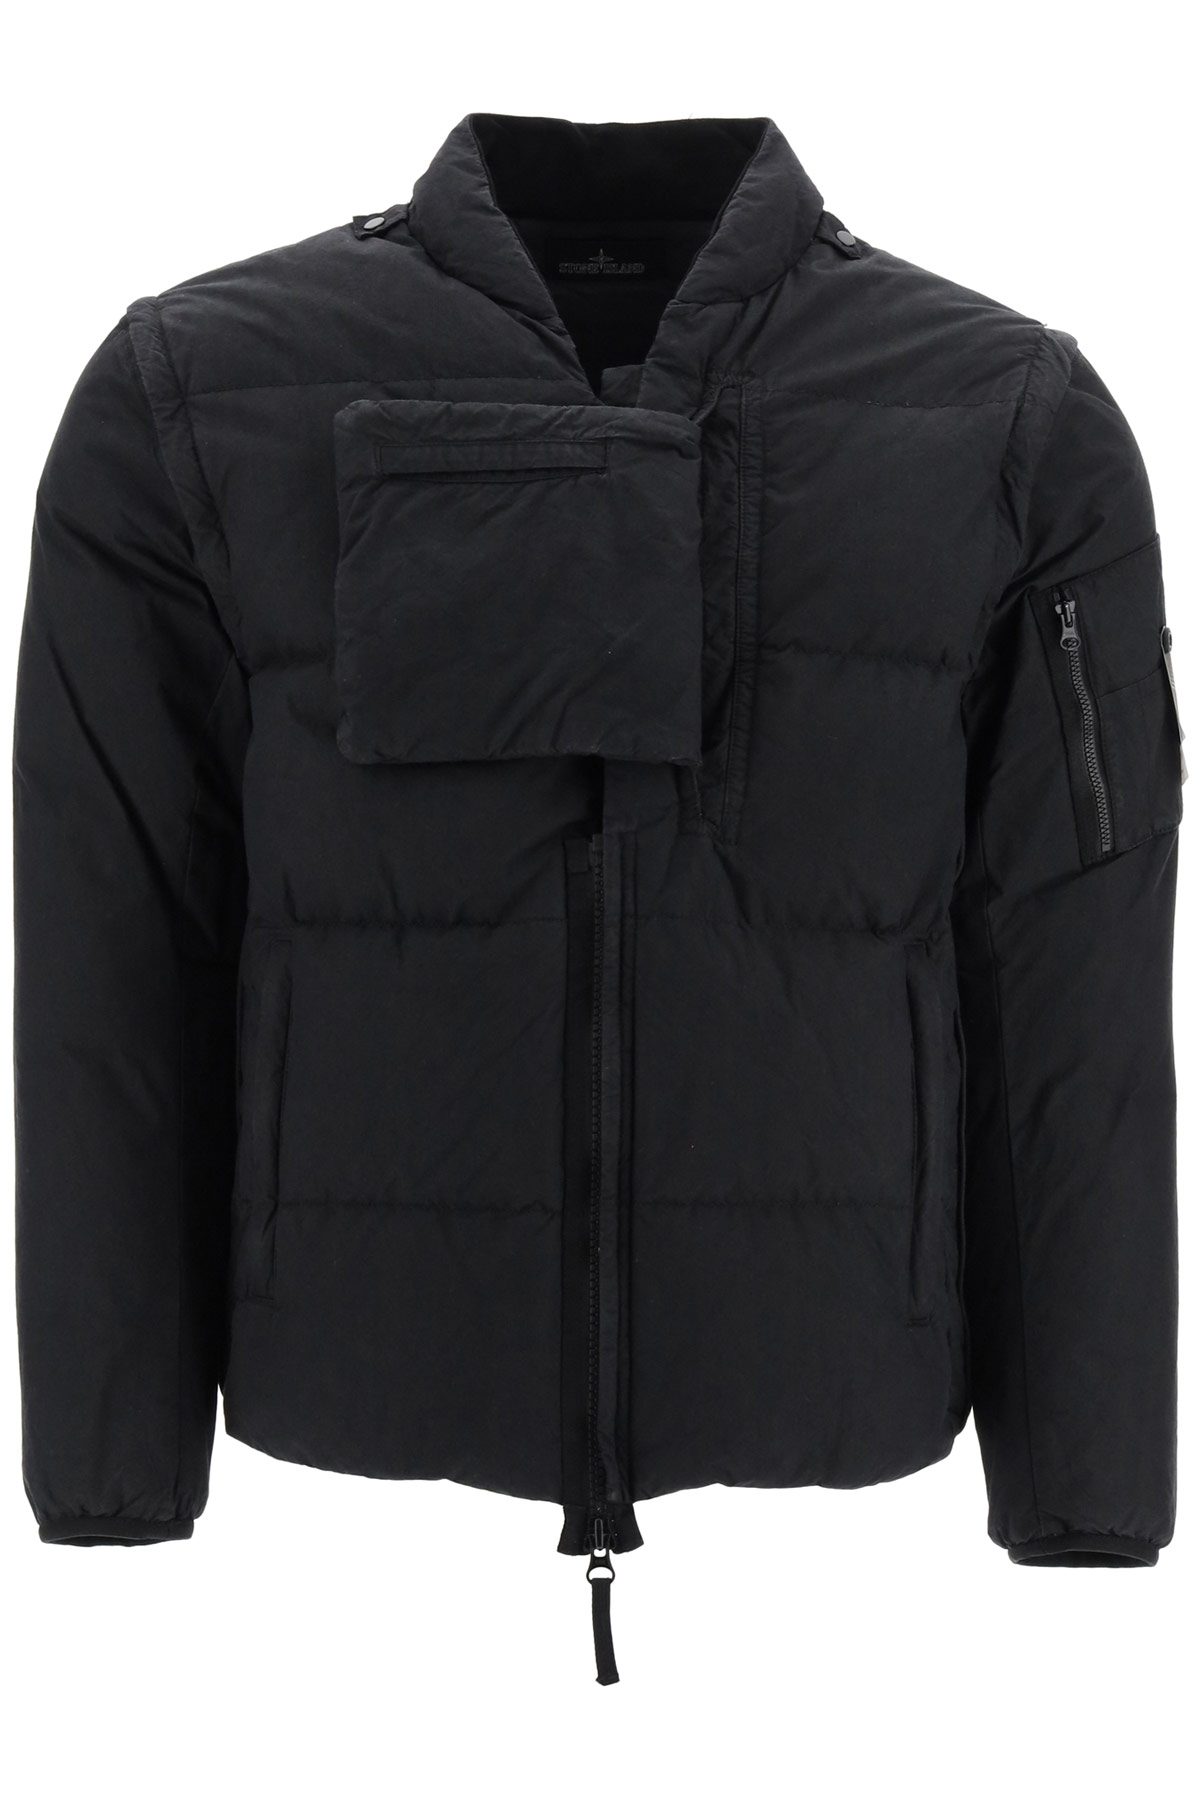 STONE ISLAND SHADOW PROJECT 남자 아우터 점퍼 Puffer jackets MO7319407B3 V0029